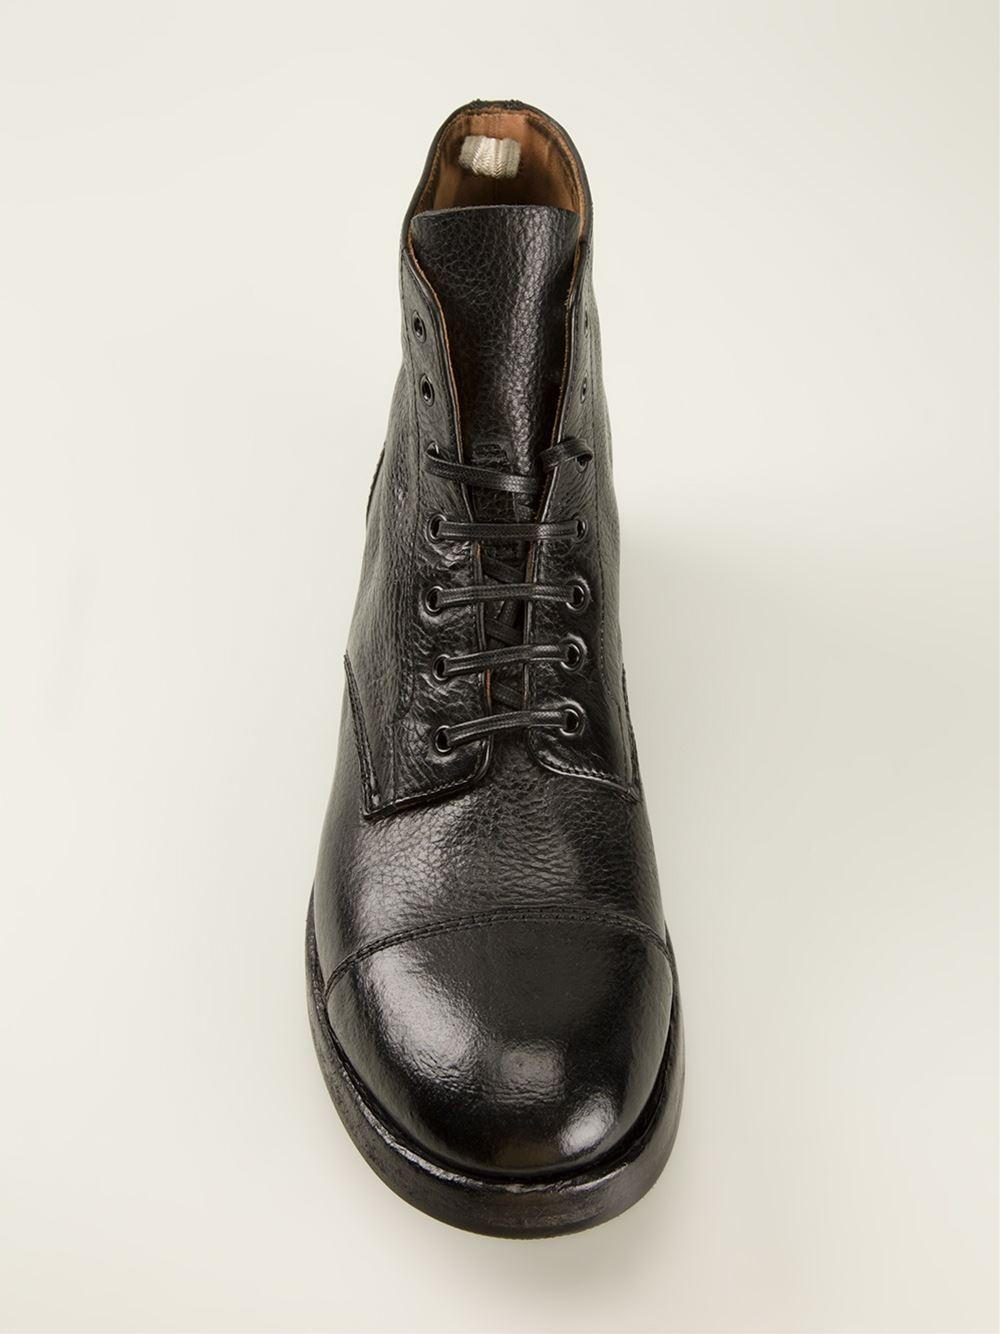 Officine Creative Serviceman boots cheap sale 2015 sale order best prices for sale for cheap price cheap new arrival pZLagWtNc